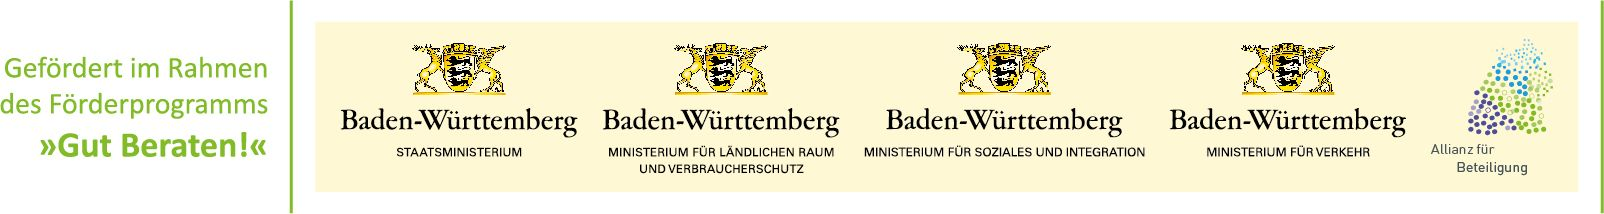 logo-gut-beraten-72dpi-rbg-webBF758AD9-57C6-08DC-CD15-3E68ADDDFAA7.jpg